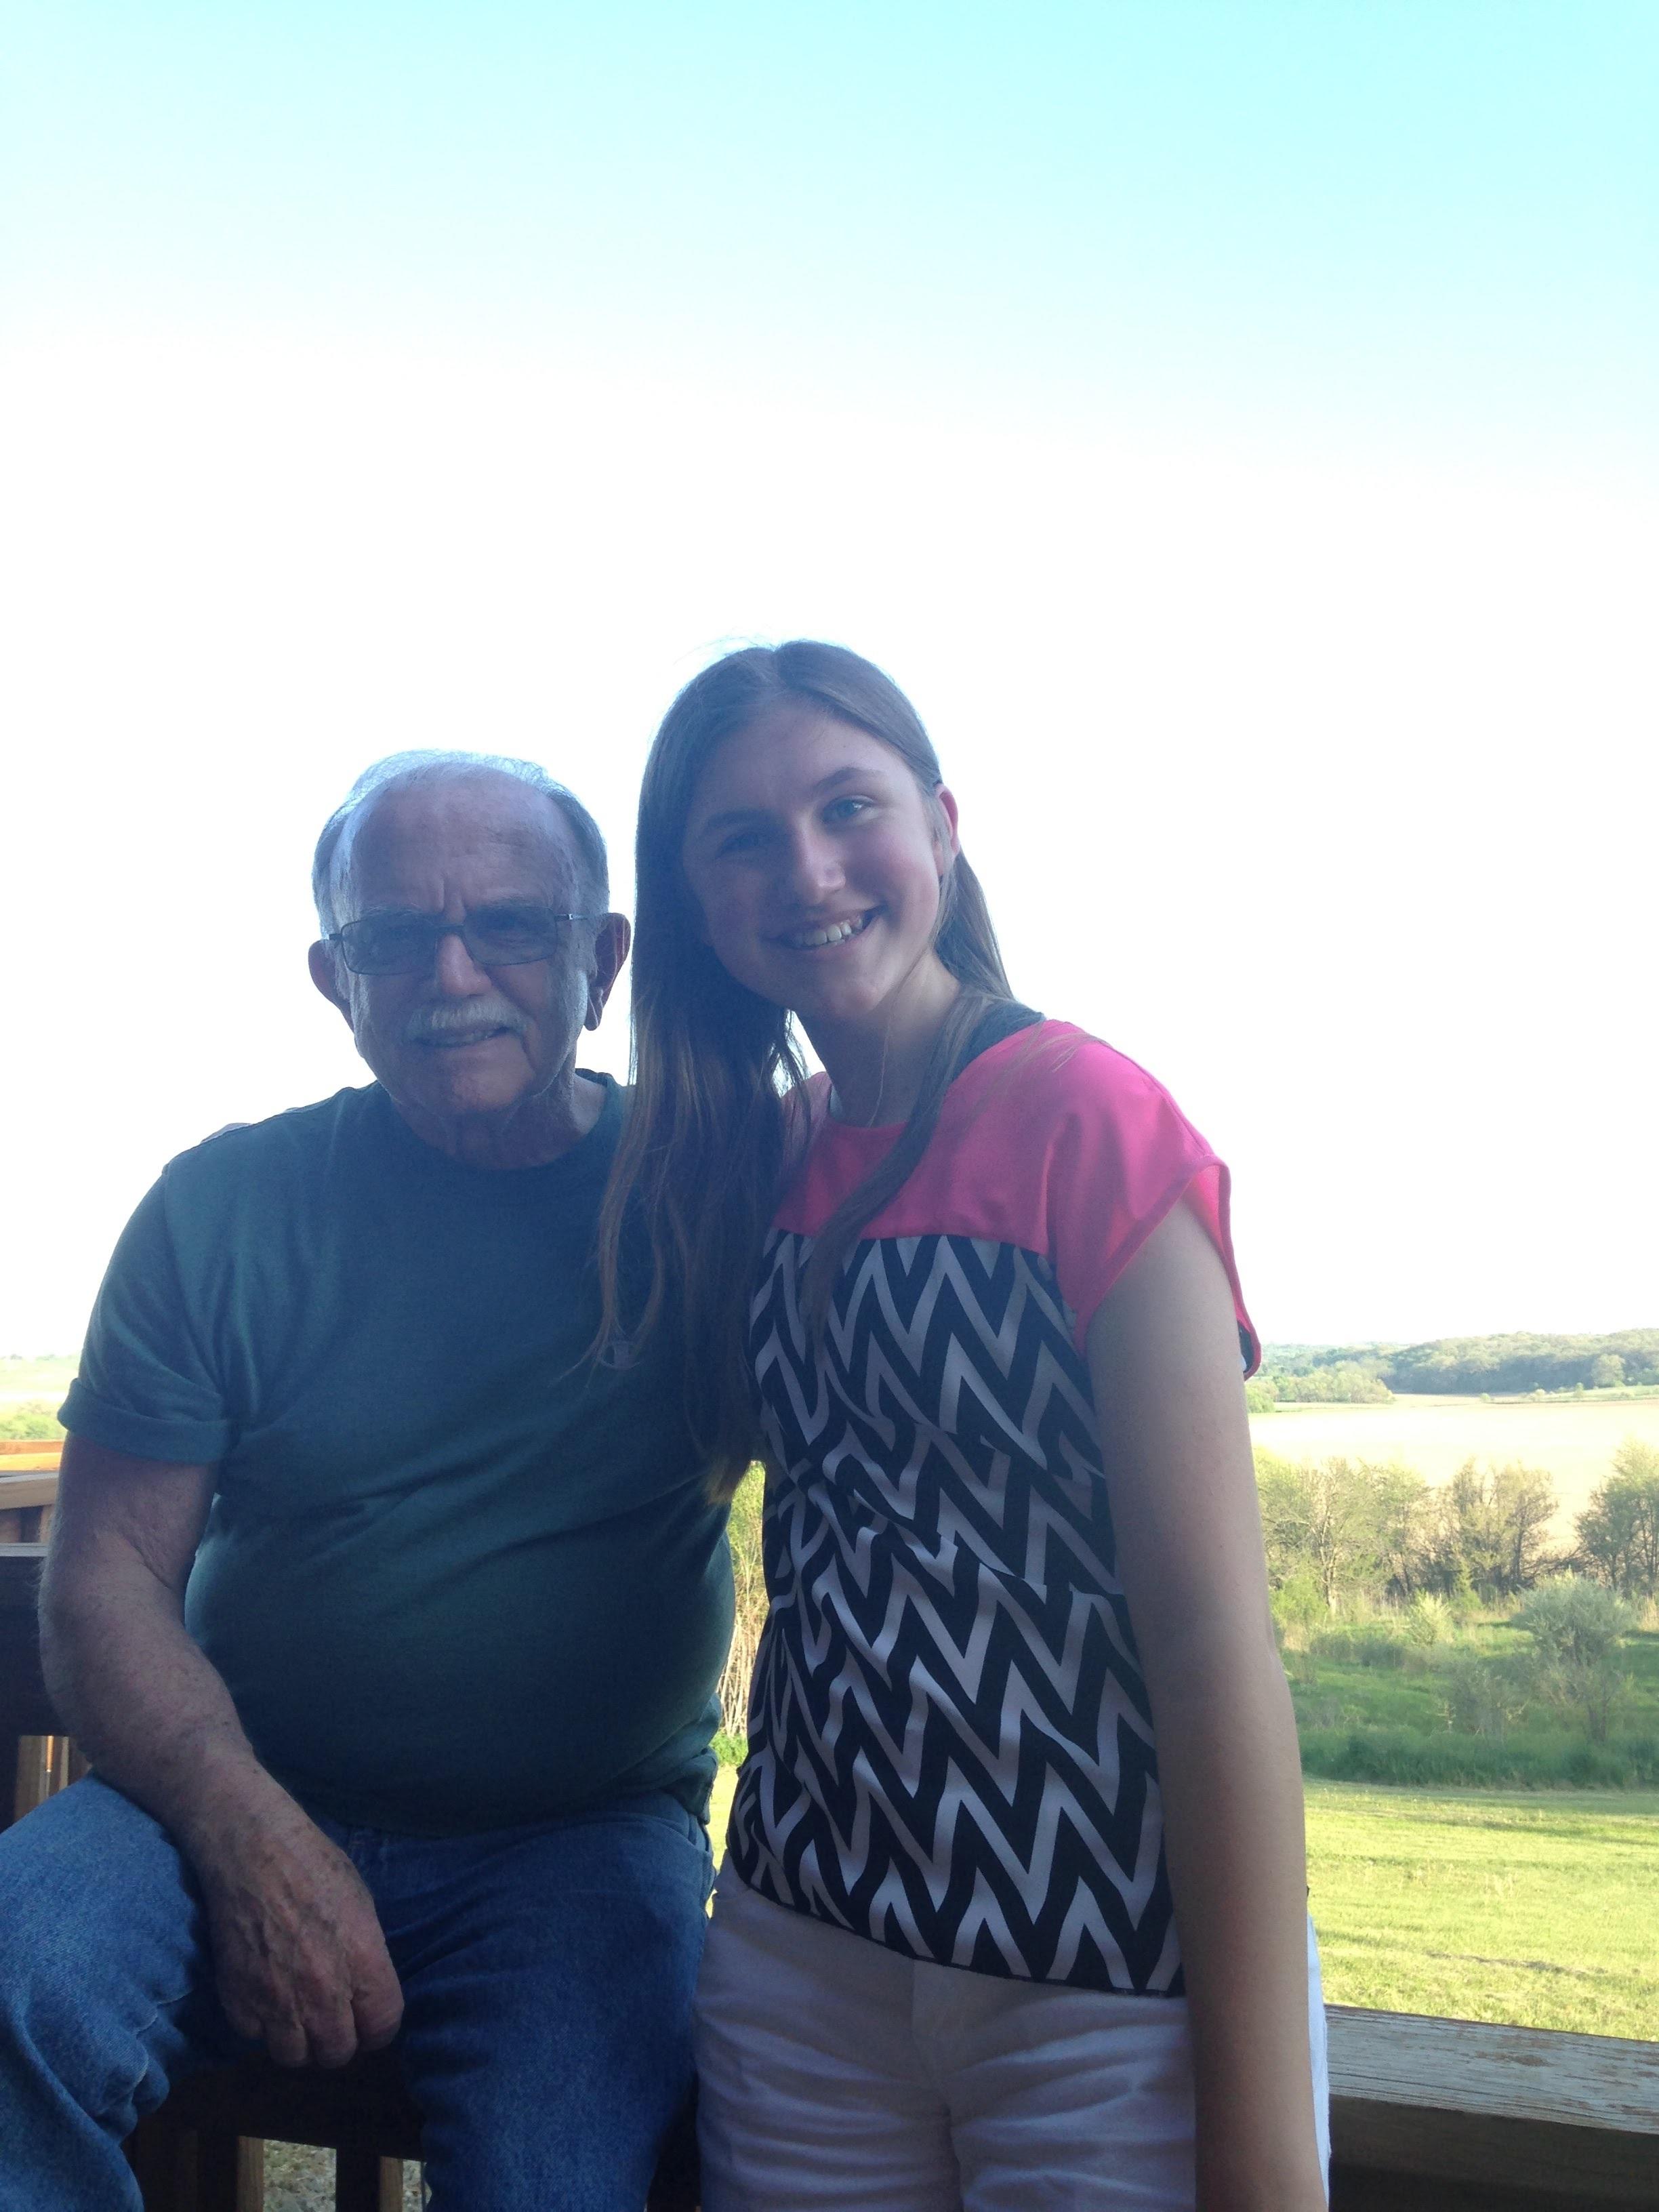 Ashlee-and-Gramps.jpg